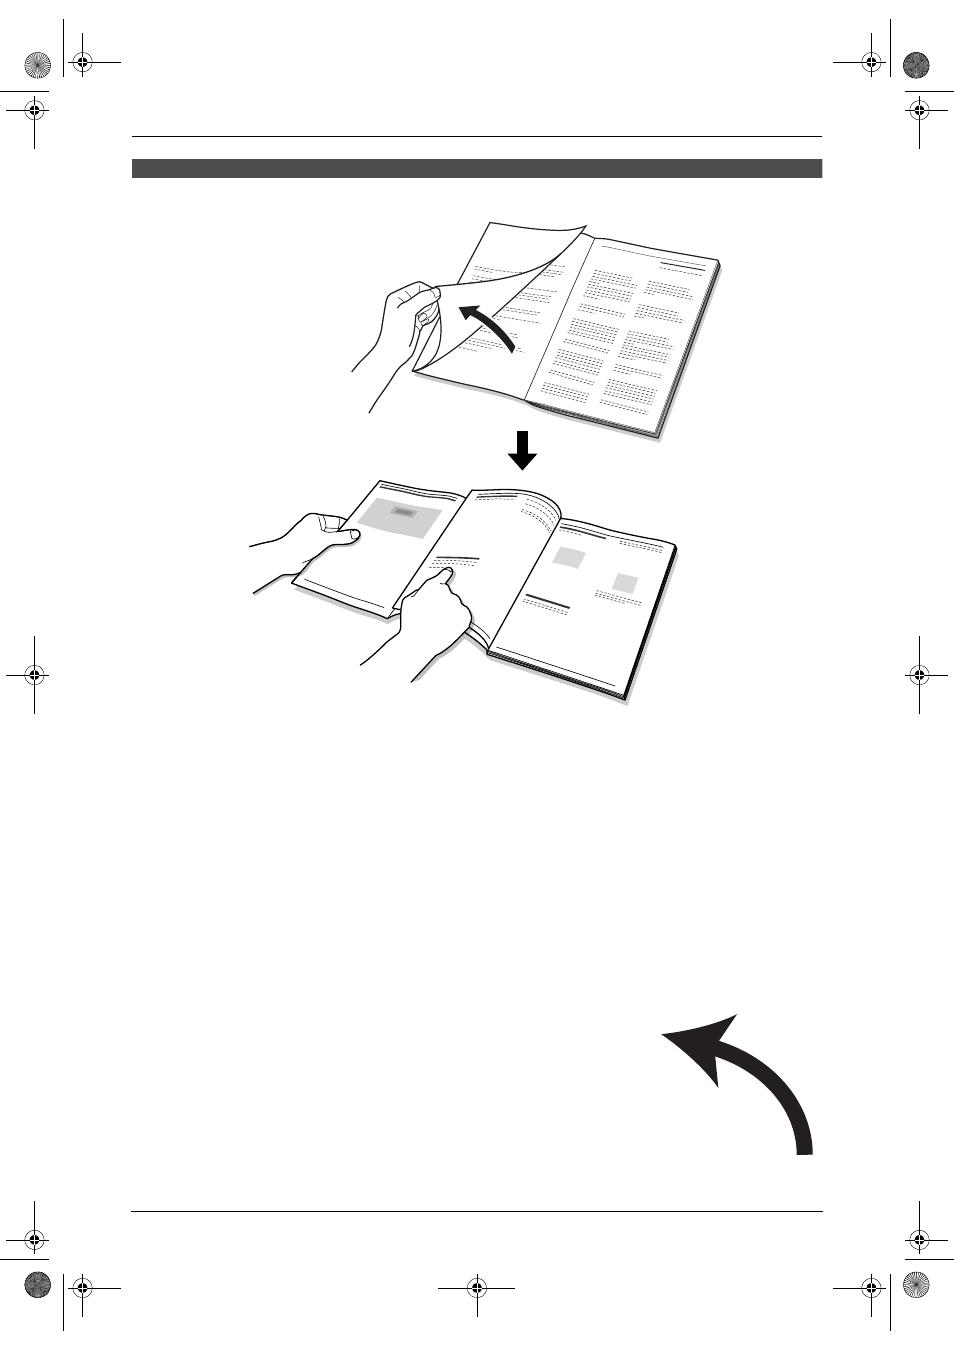 Факс Panasonic Kx-fl403 инструкция - картинка 2